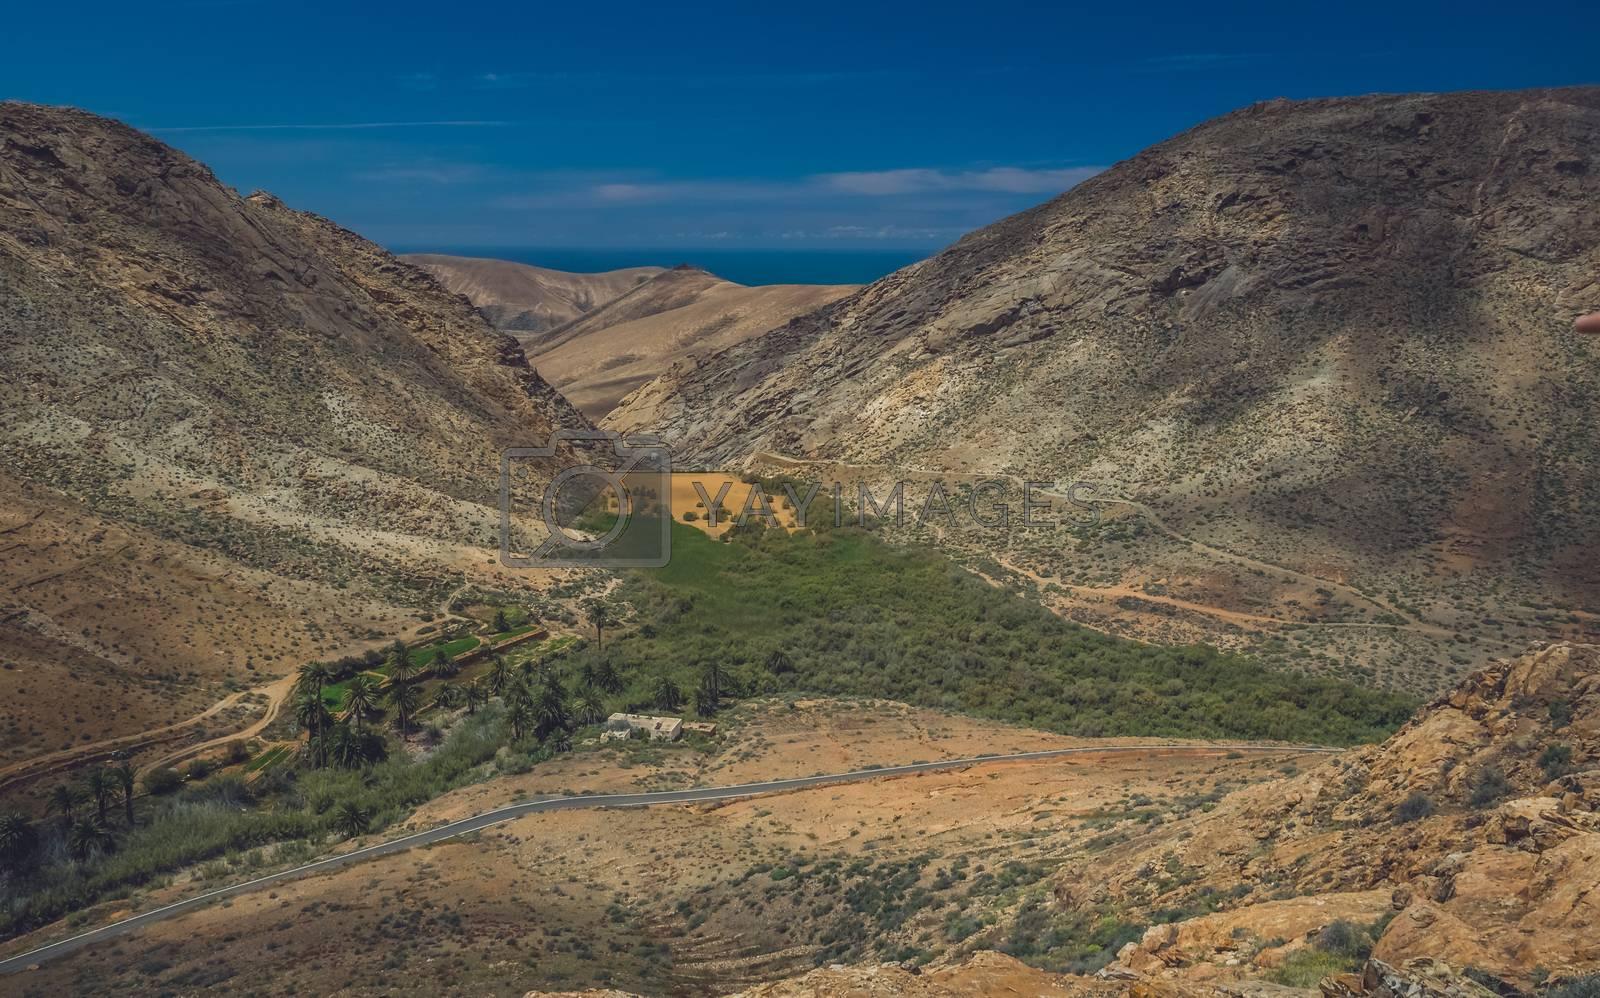 Penitas dam in the Pajara municipality in Fuerteventura, Canary Islands, Spain